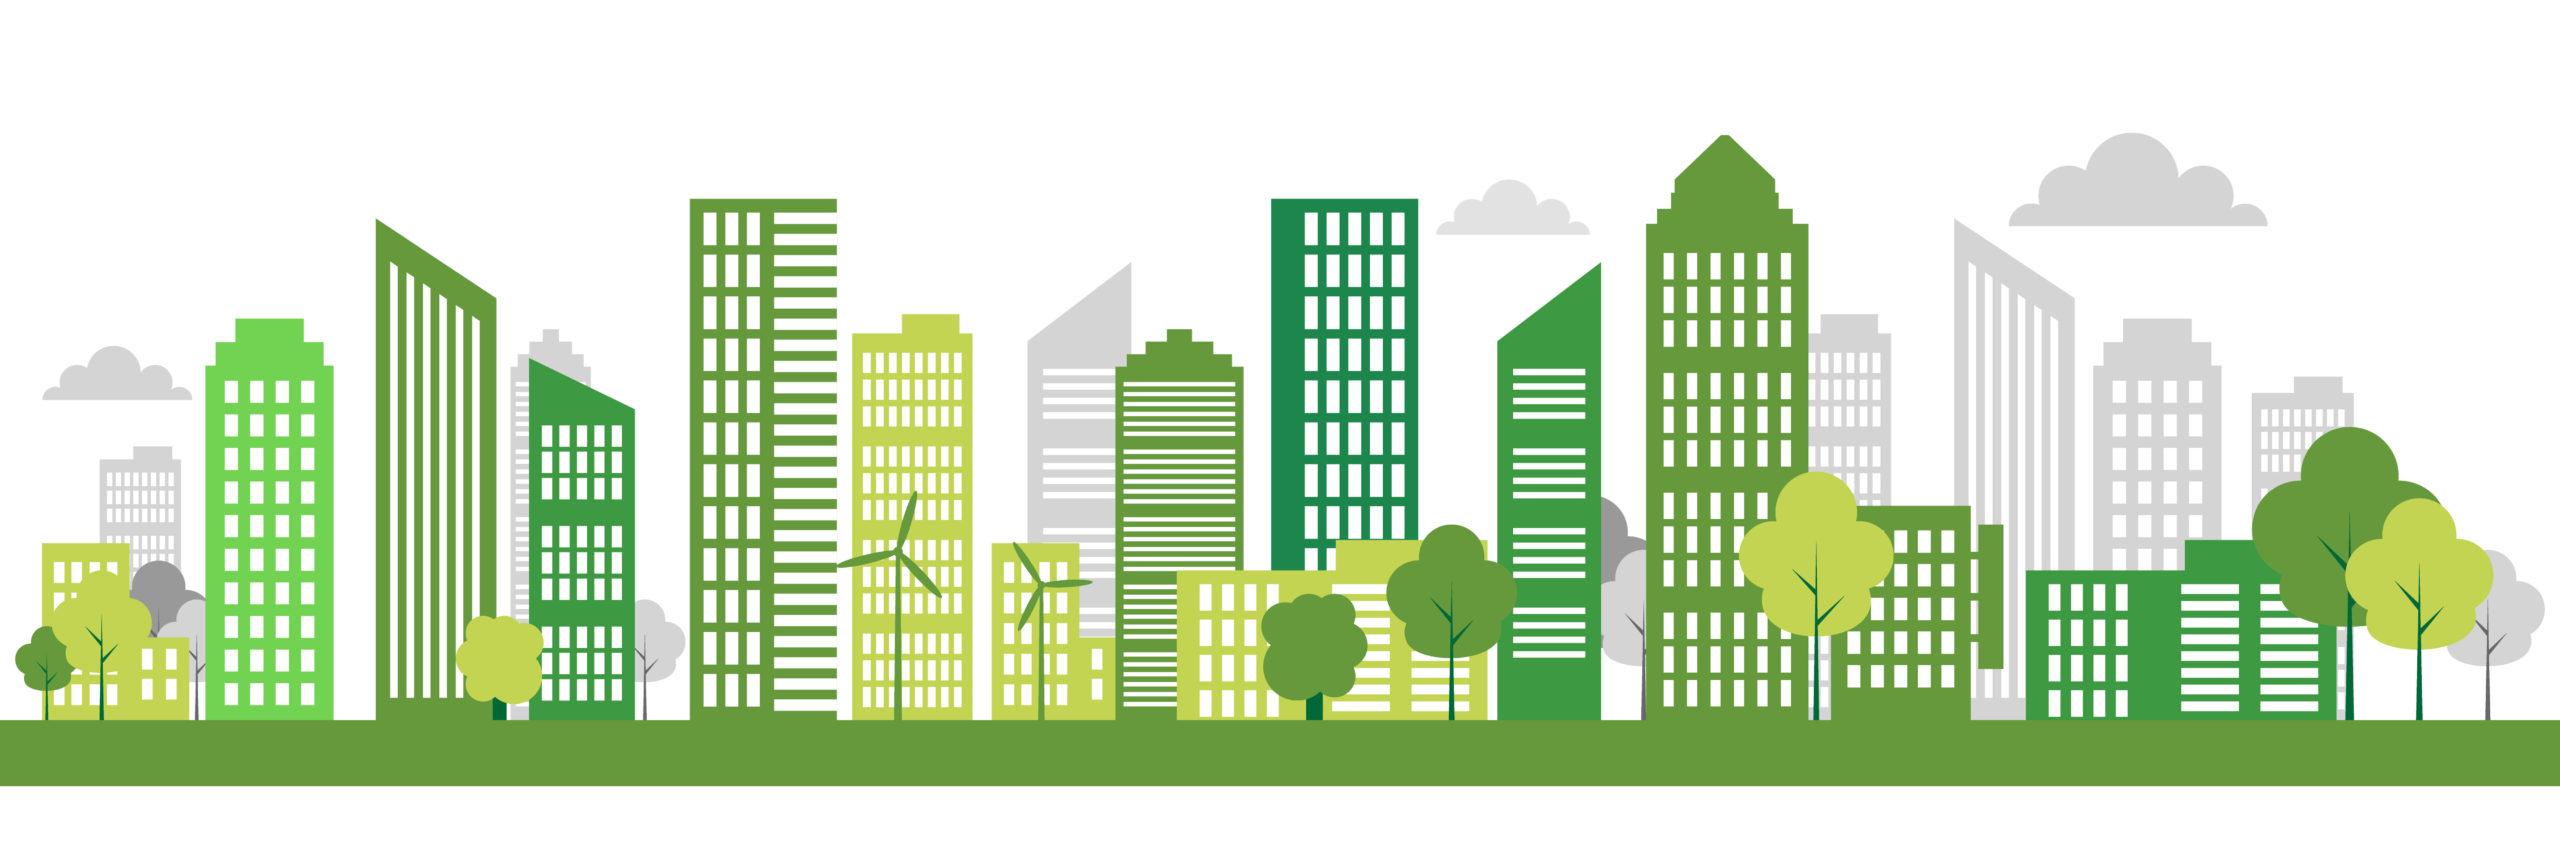 Stadtgroesse_nachhaltige_mobilitaet